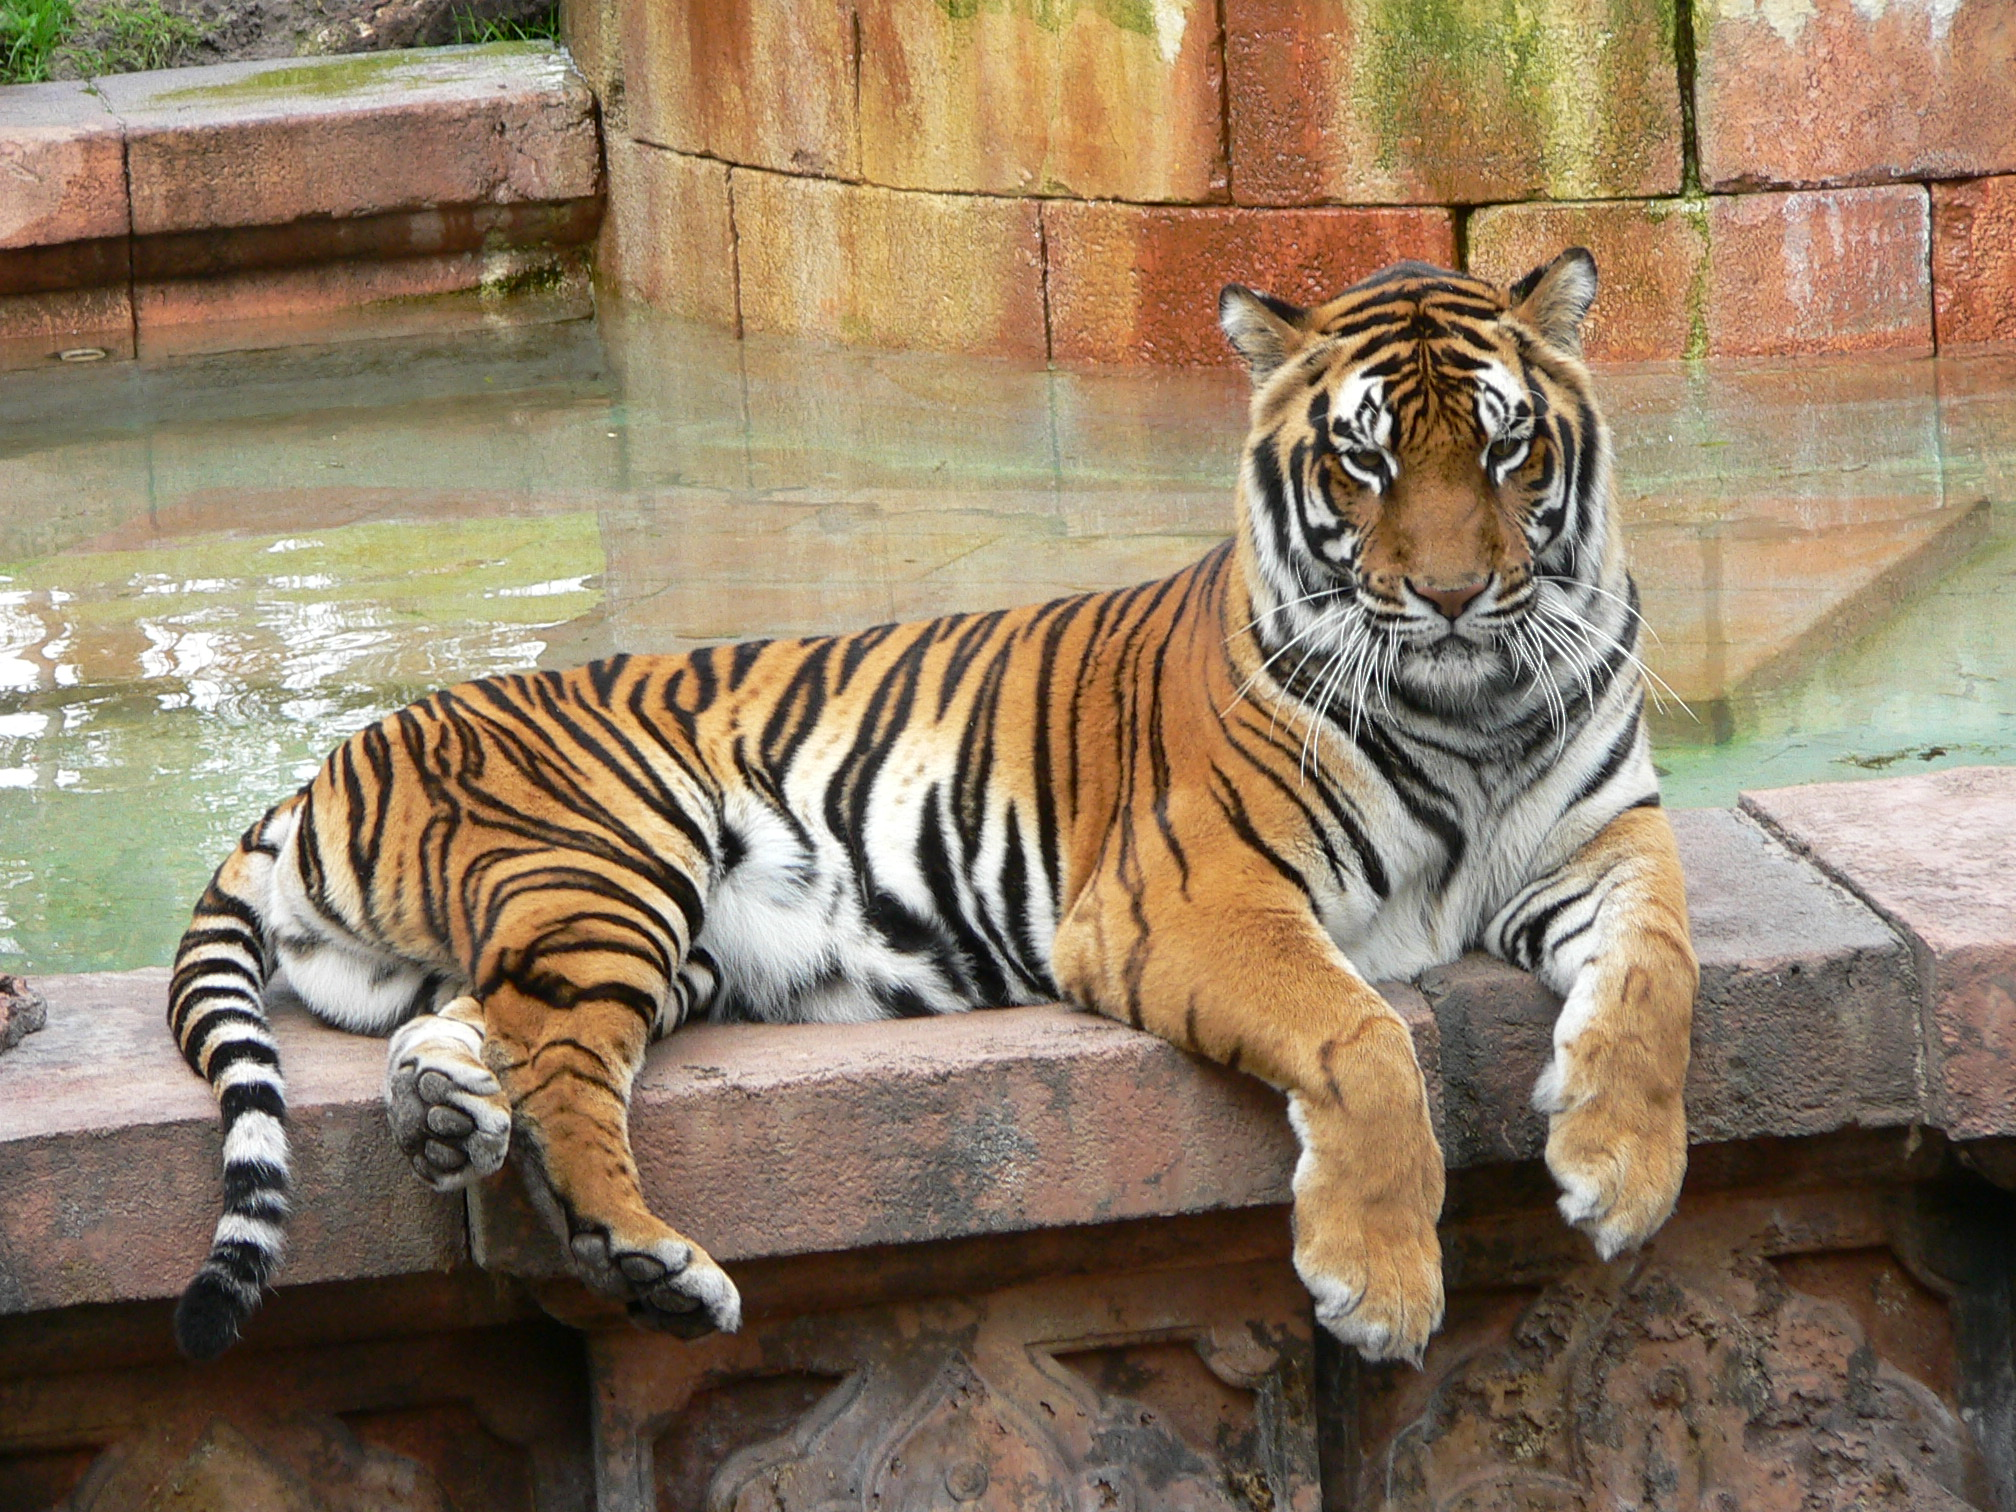 Tiger Tiger datant amour et amis datant site